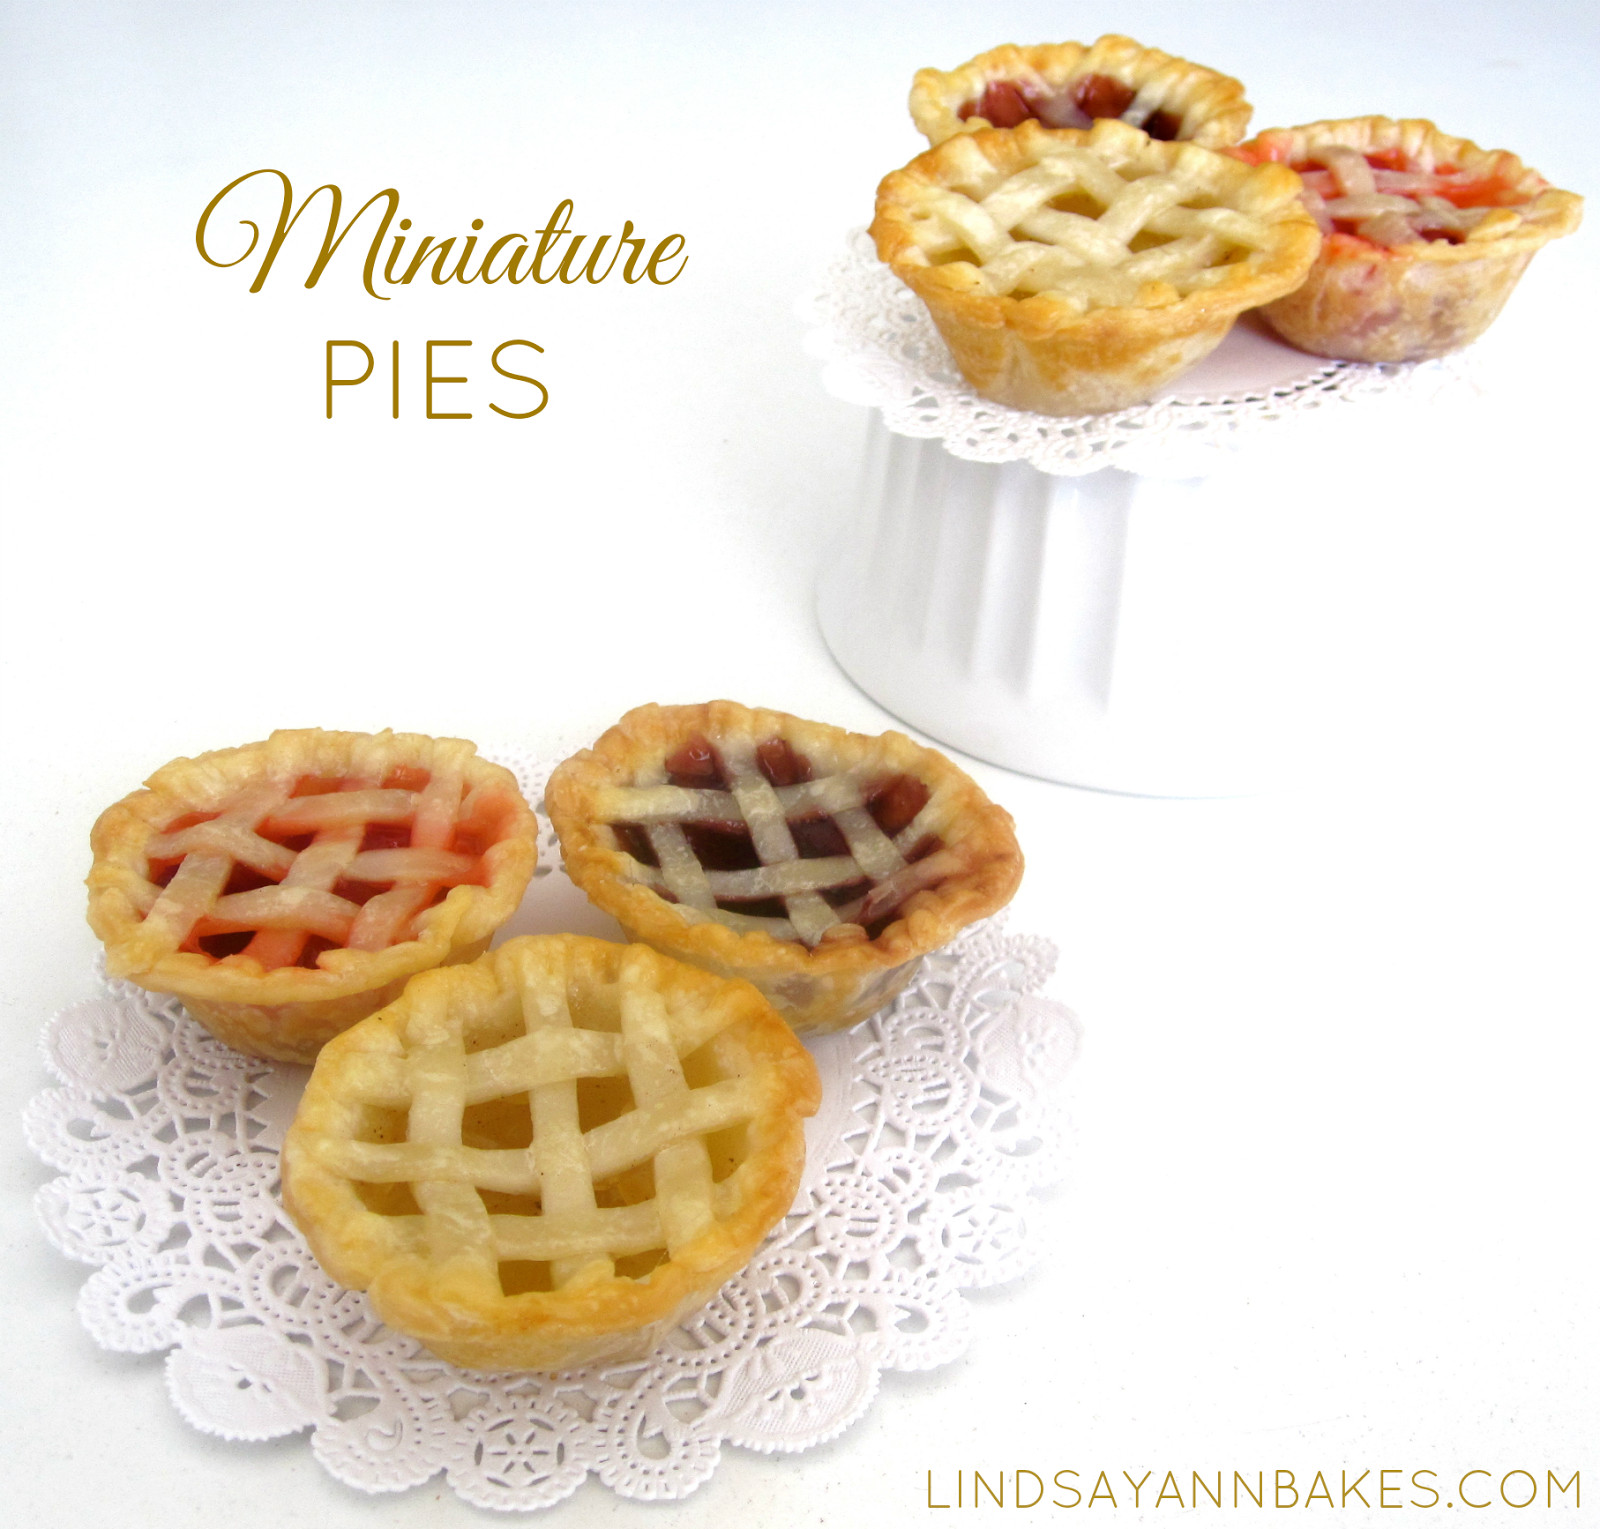 Mini Pie Recipes  VIDEO Miniature Pies in a Cupcake Pan Lindsay Ann Bakes